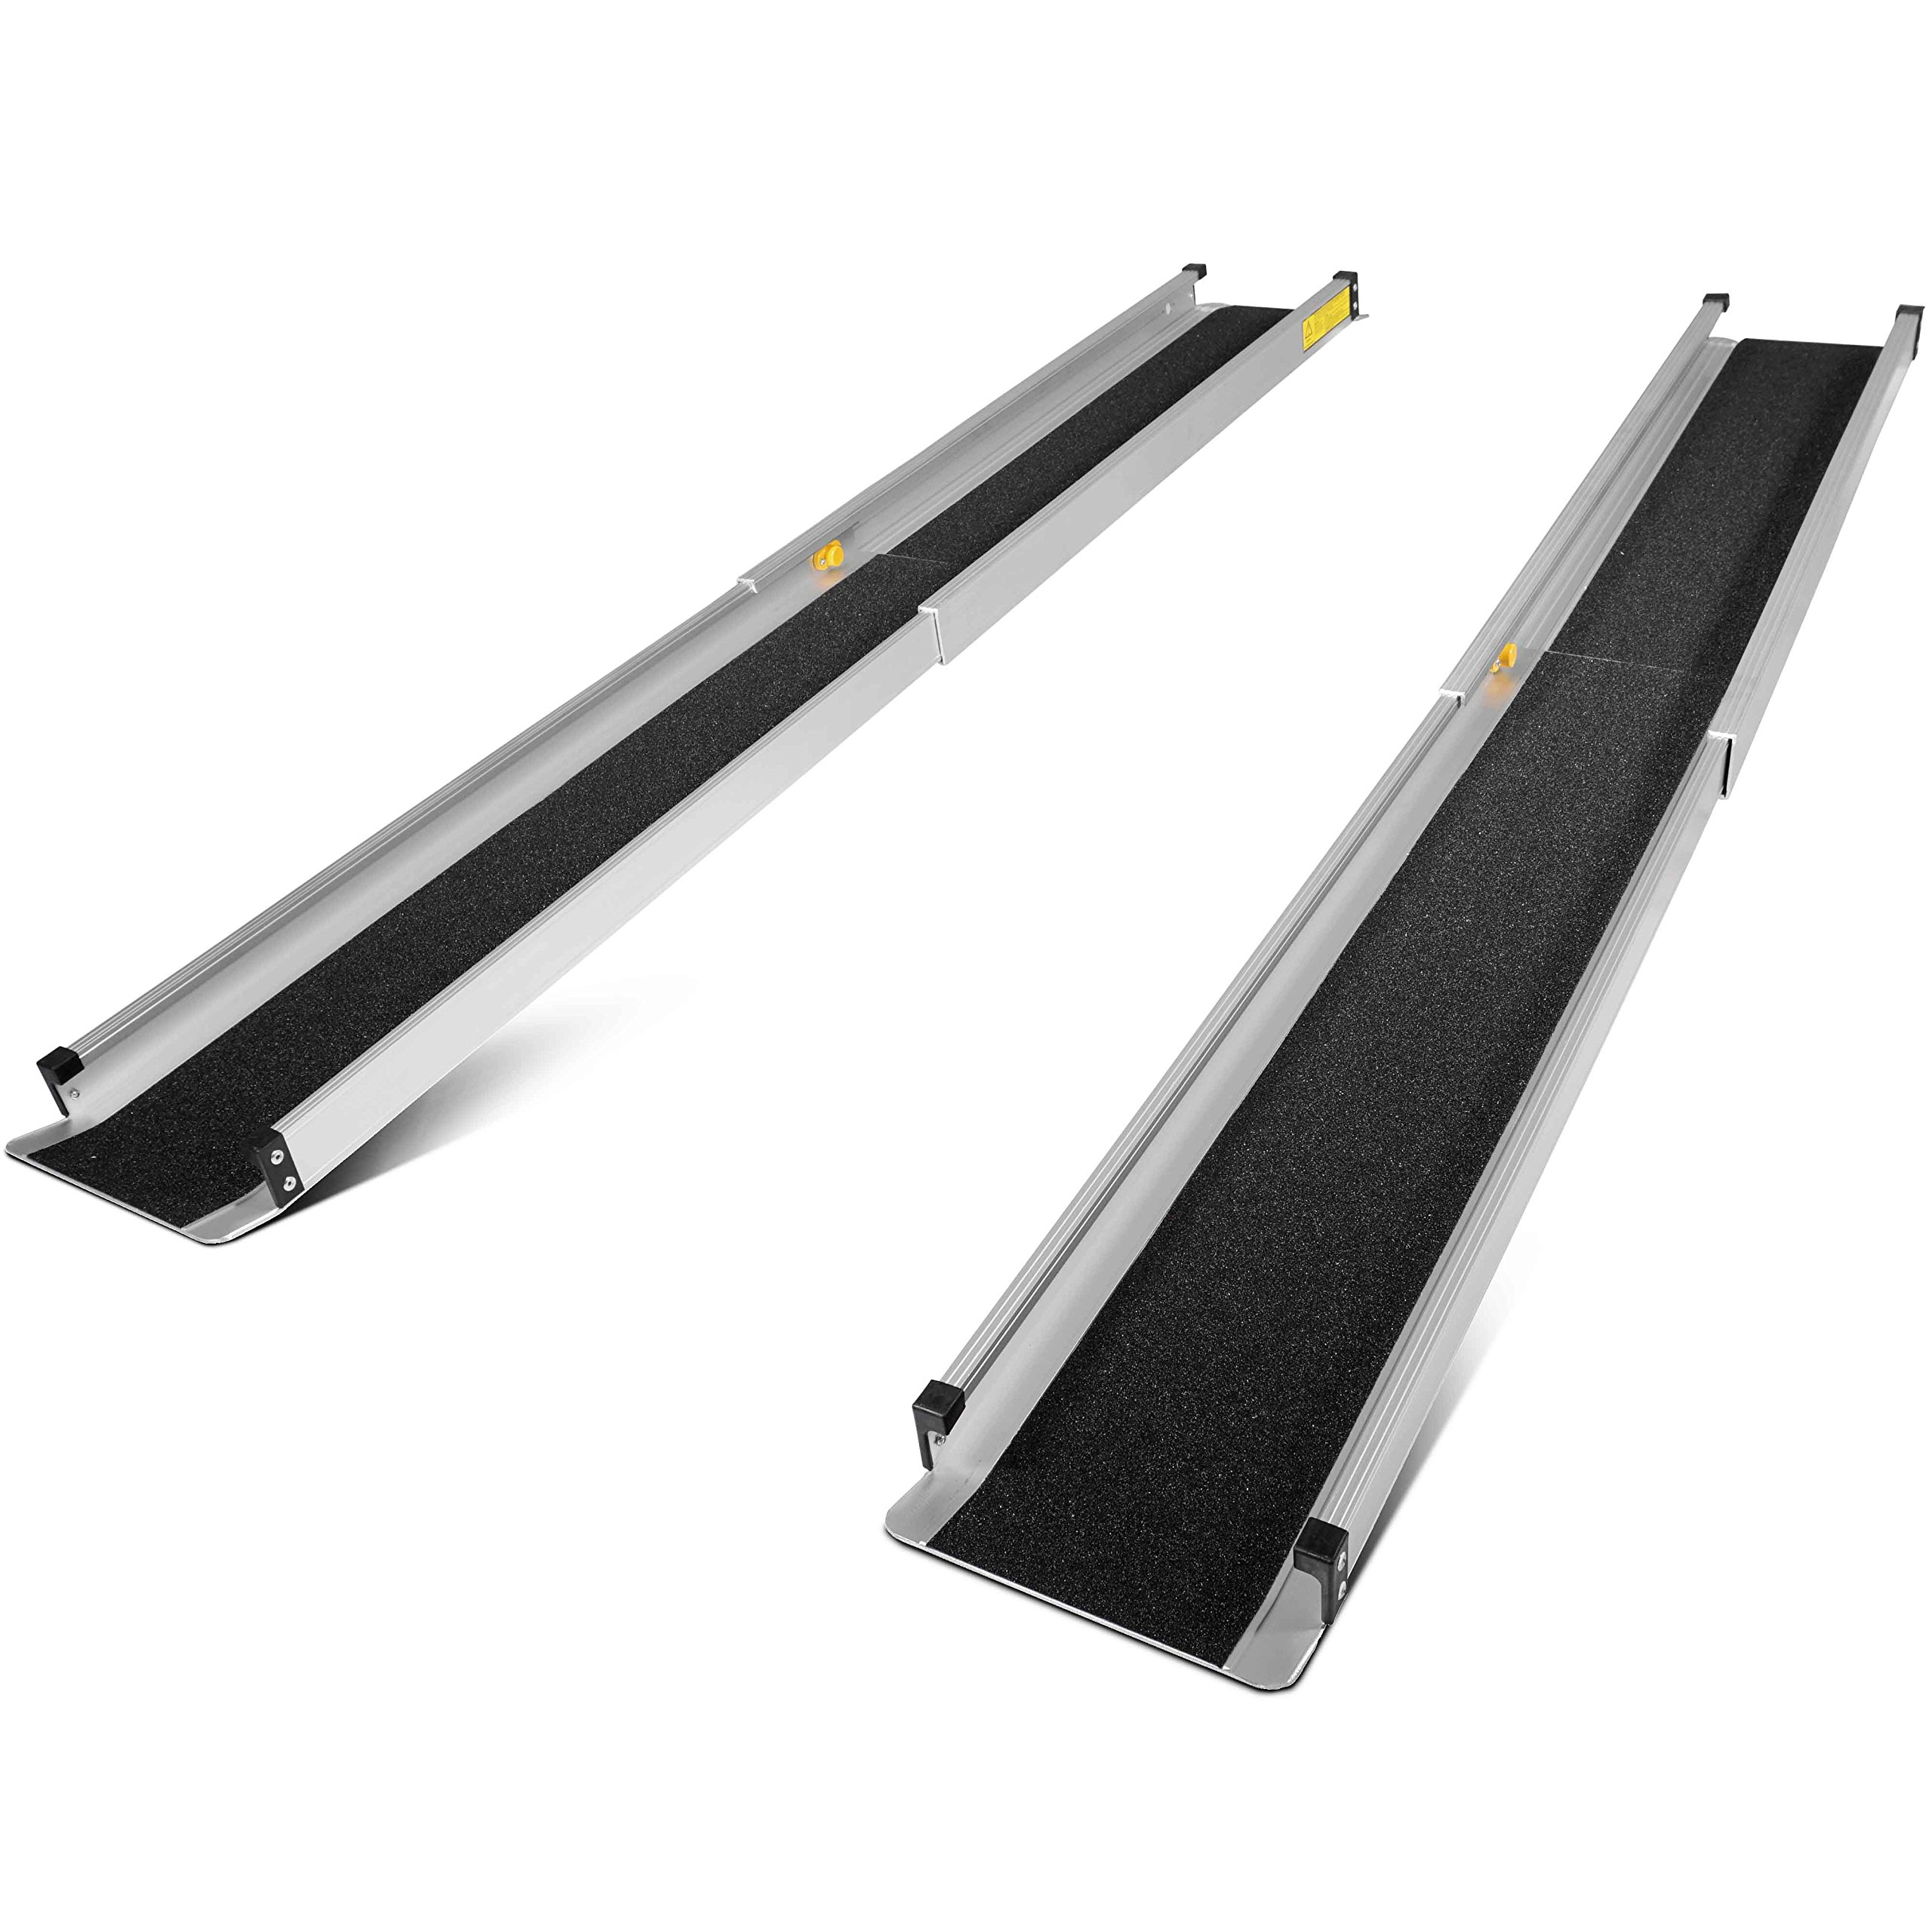 Titan 3'-5' Telescoping Portable Adjustable Aluminum Loading Wheelchair Ramp